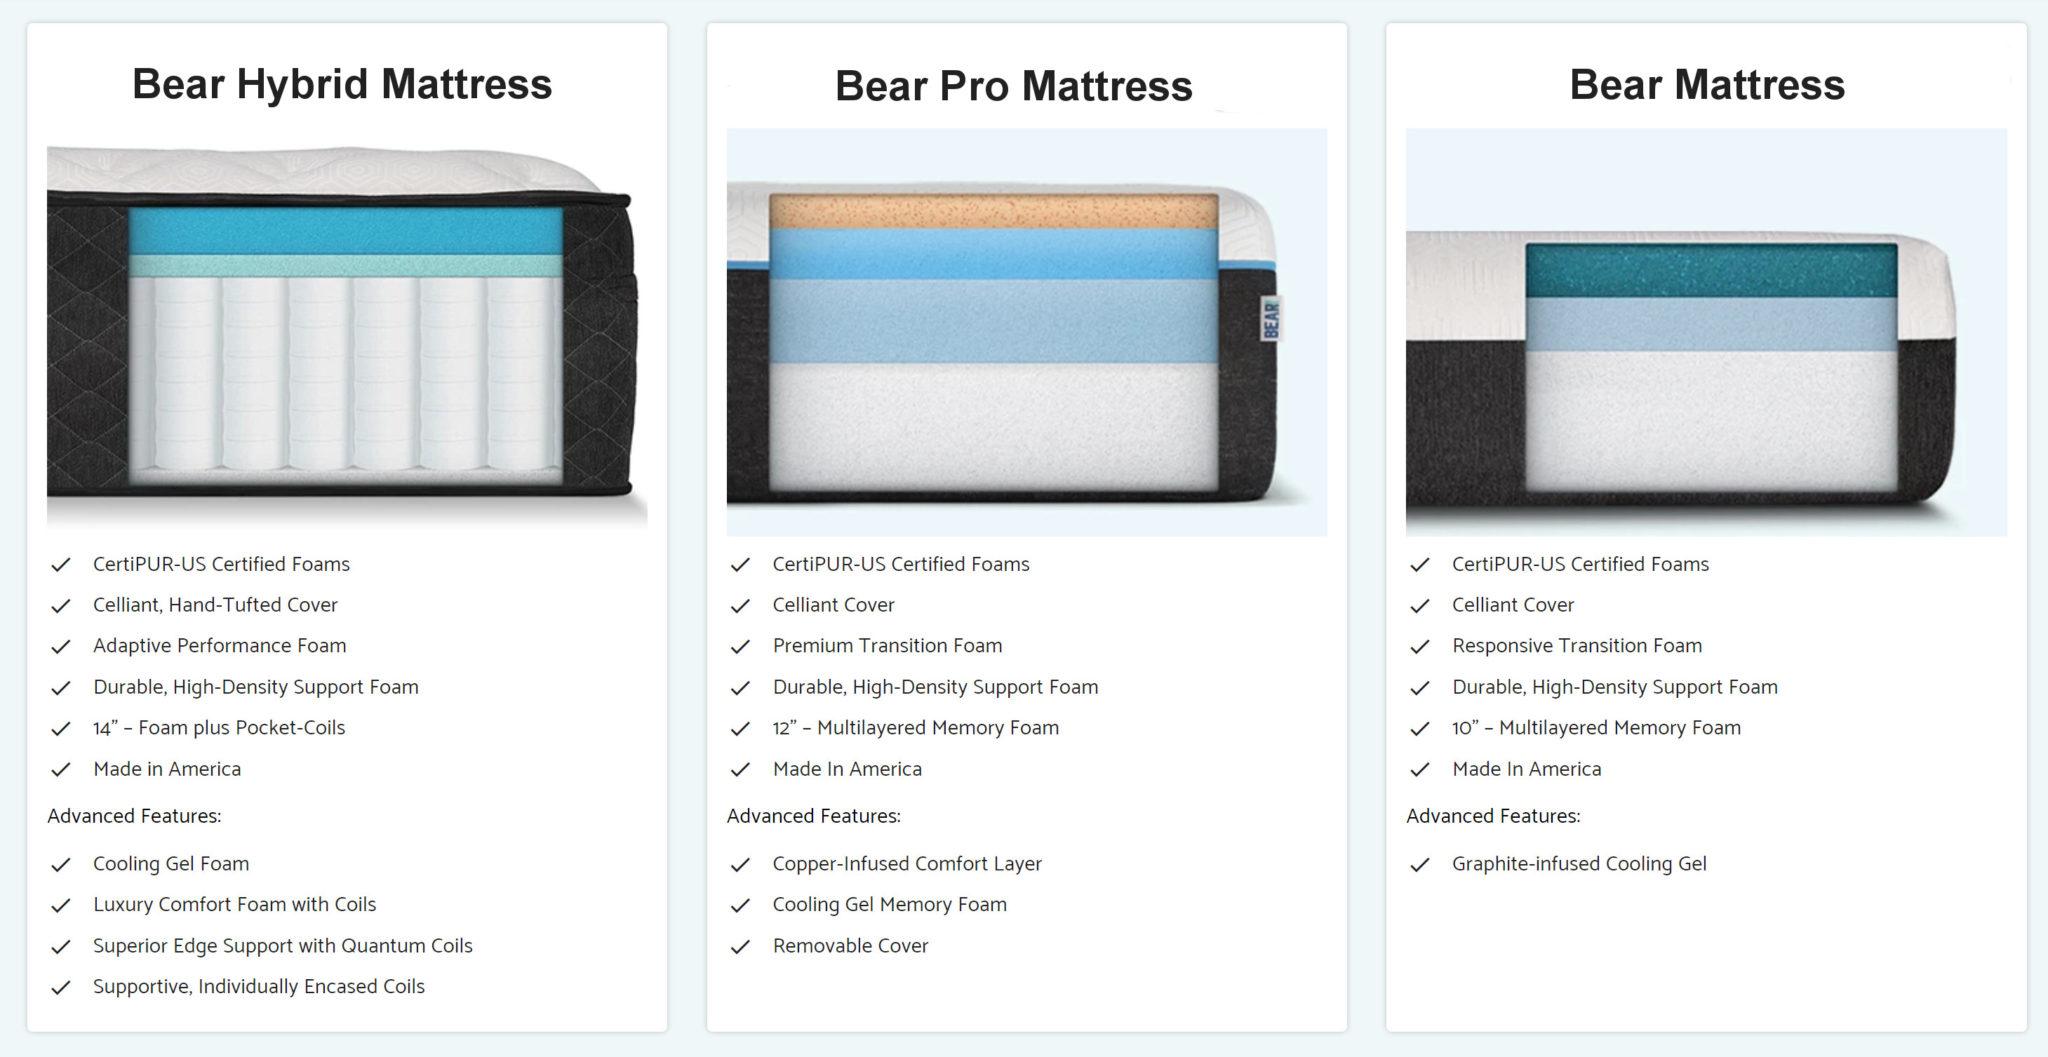 bear mattress models and options